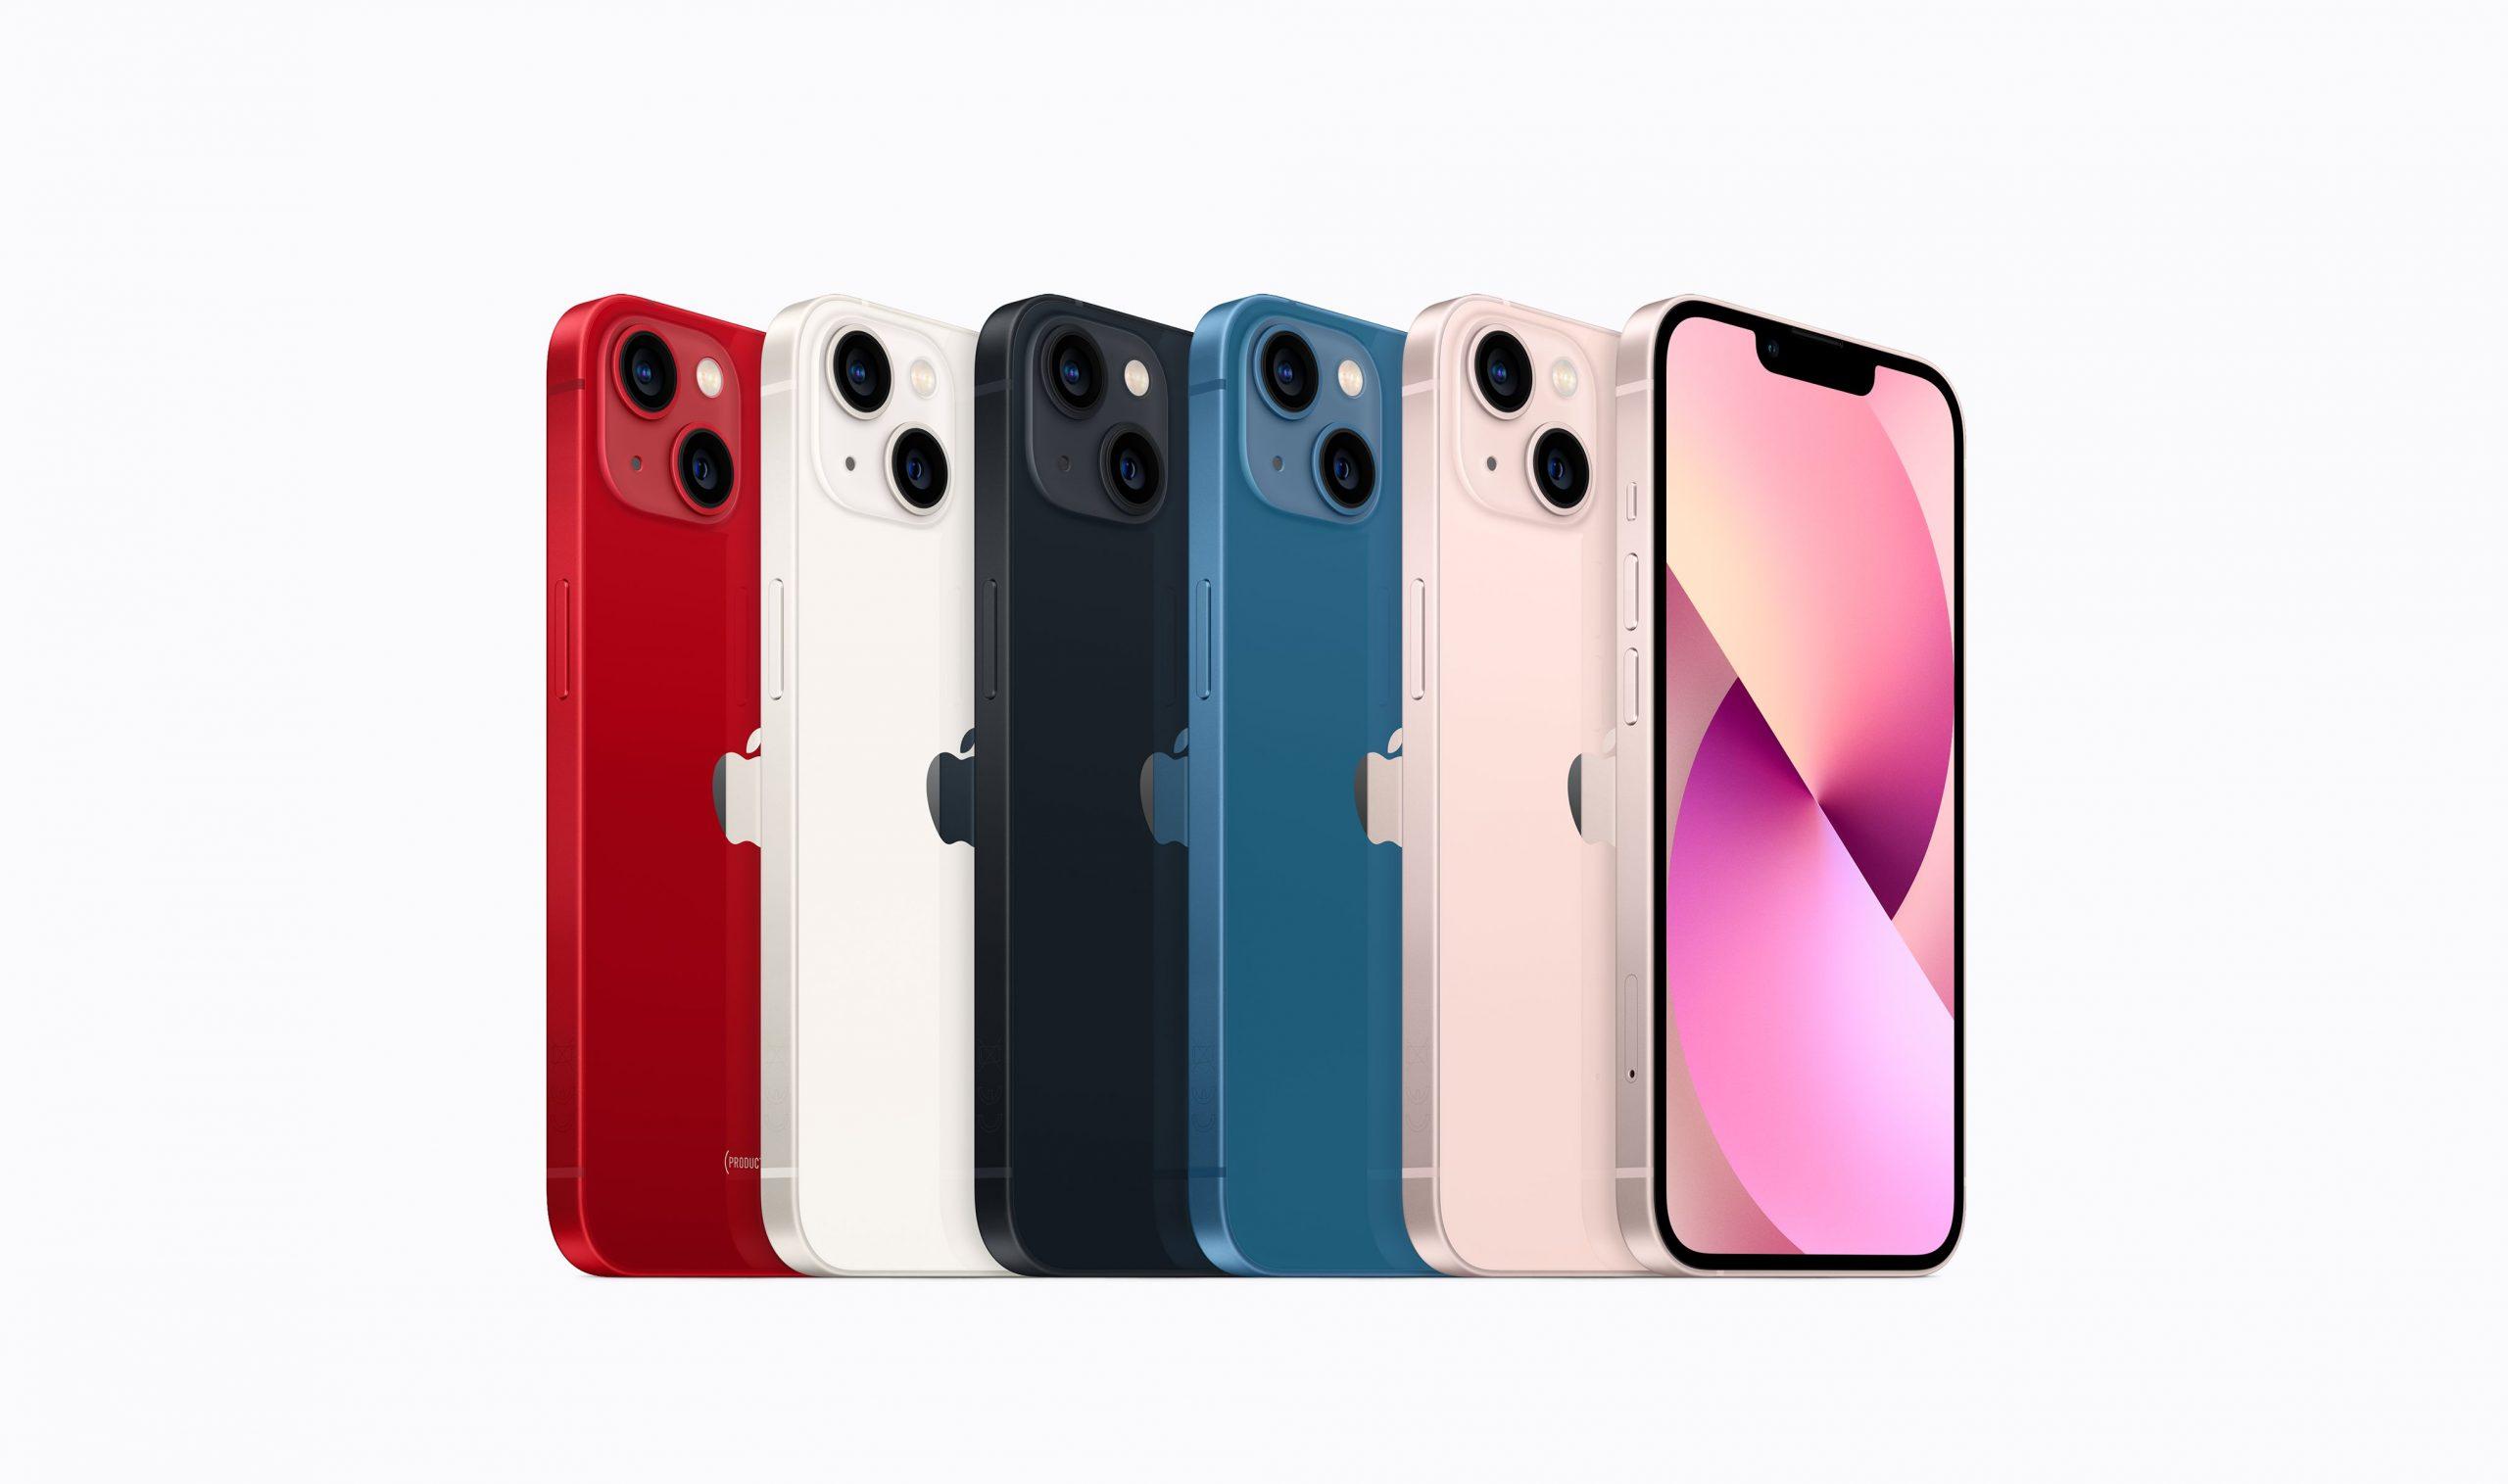 iphone 13 released